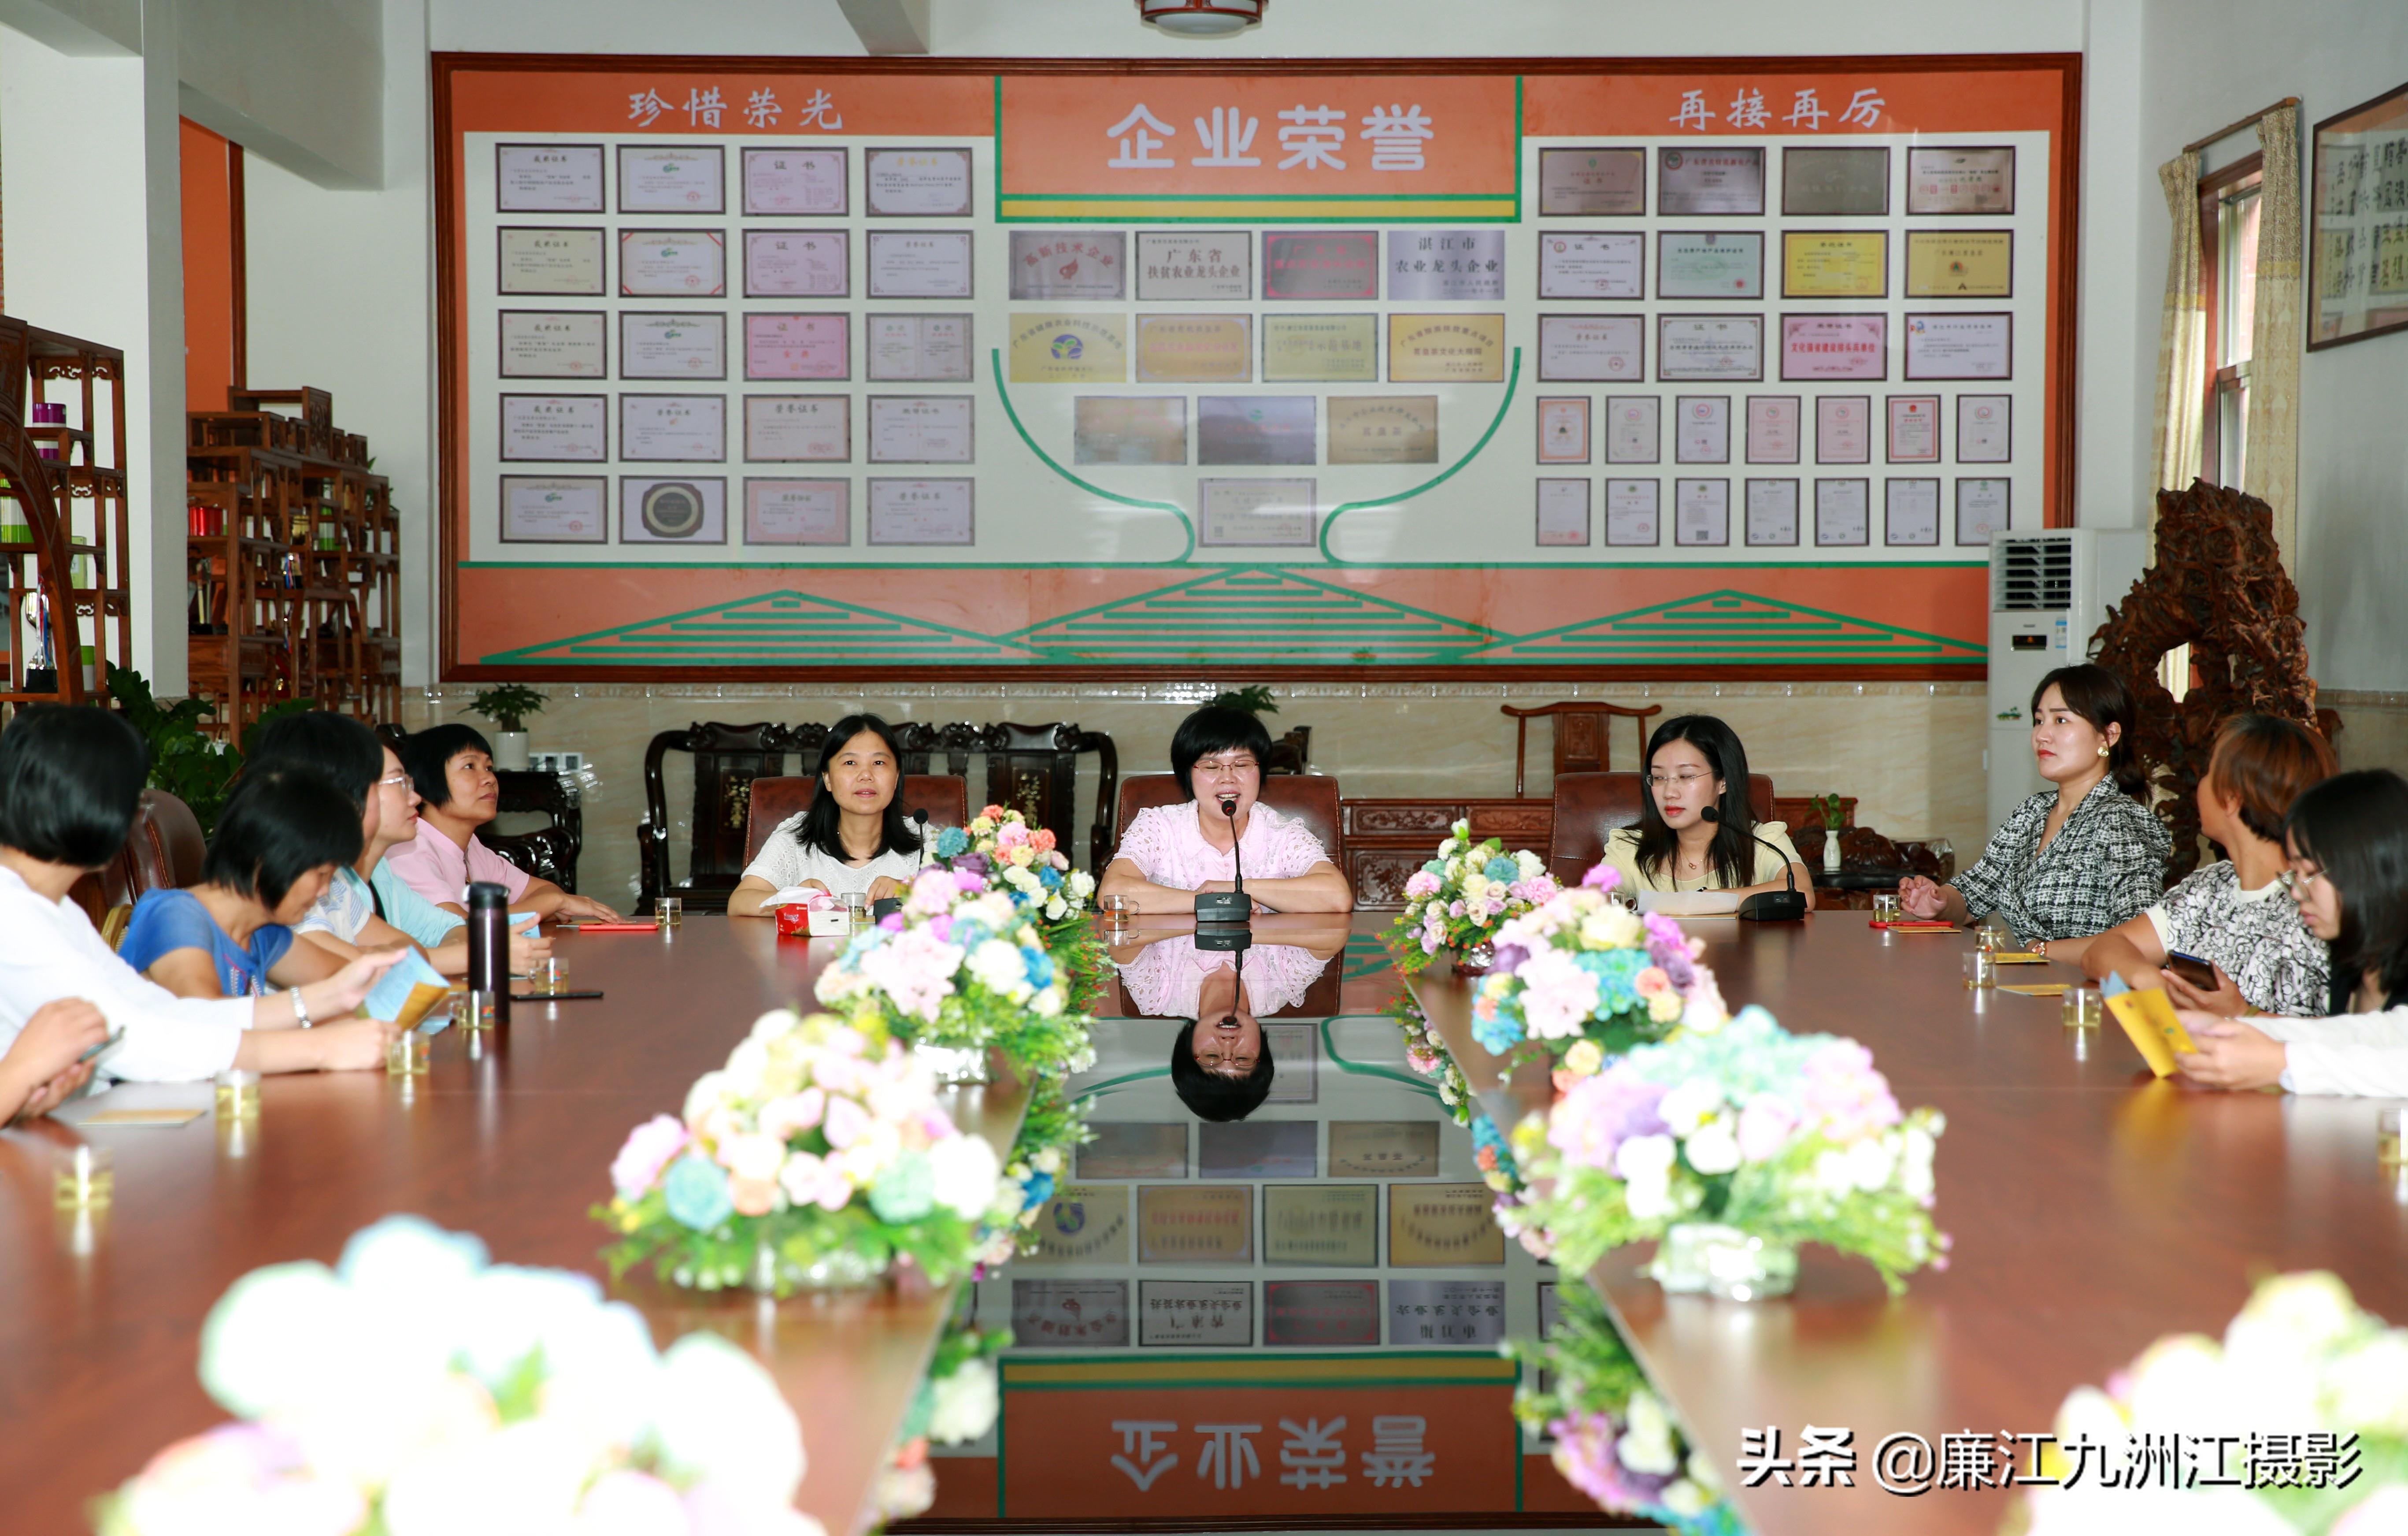 「廉江」江�T市新���^�D女代表到�V�|茗皇茶�I有限公司�⒂^交流